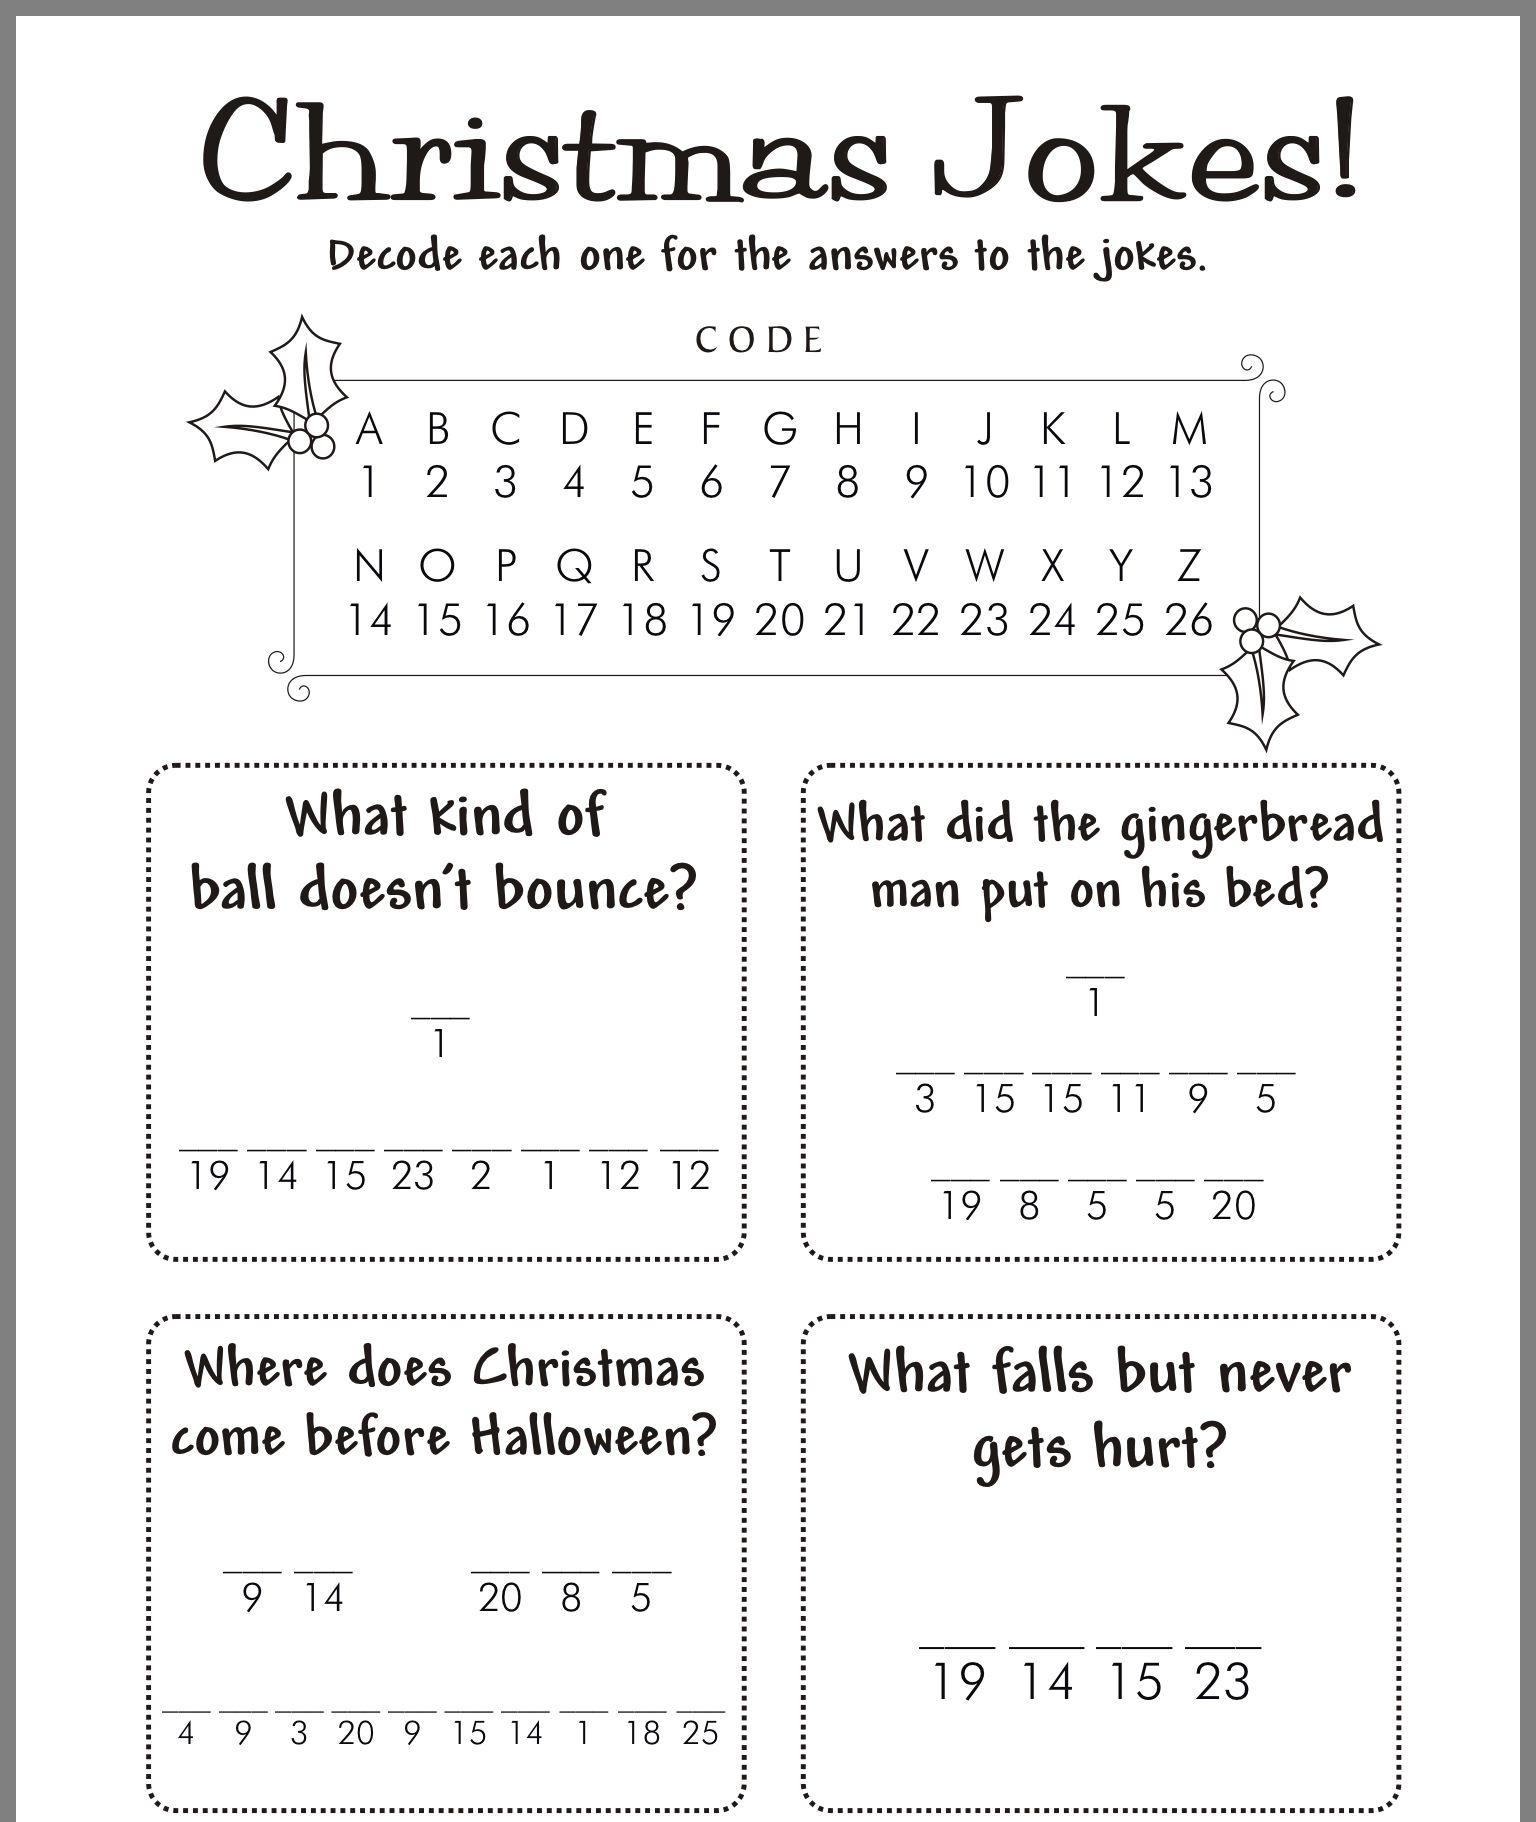 Christmas Ideas Image By Kathy Sullivan Amenn In